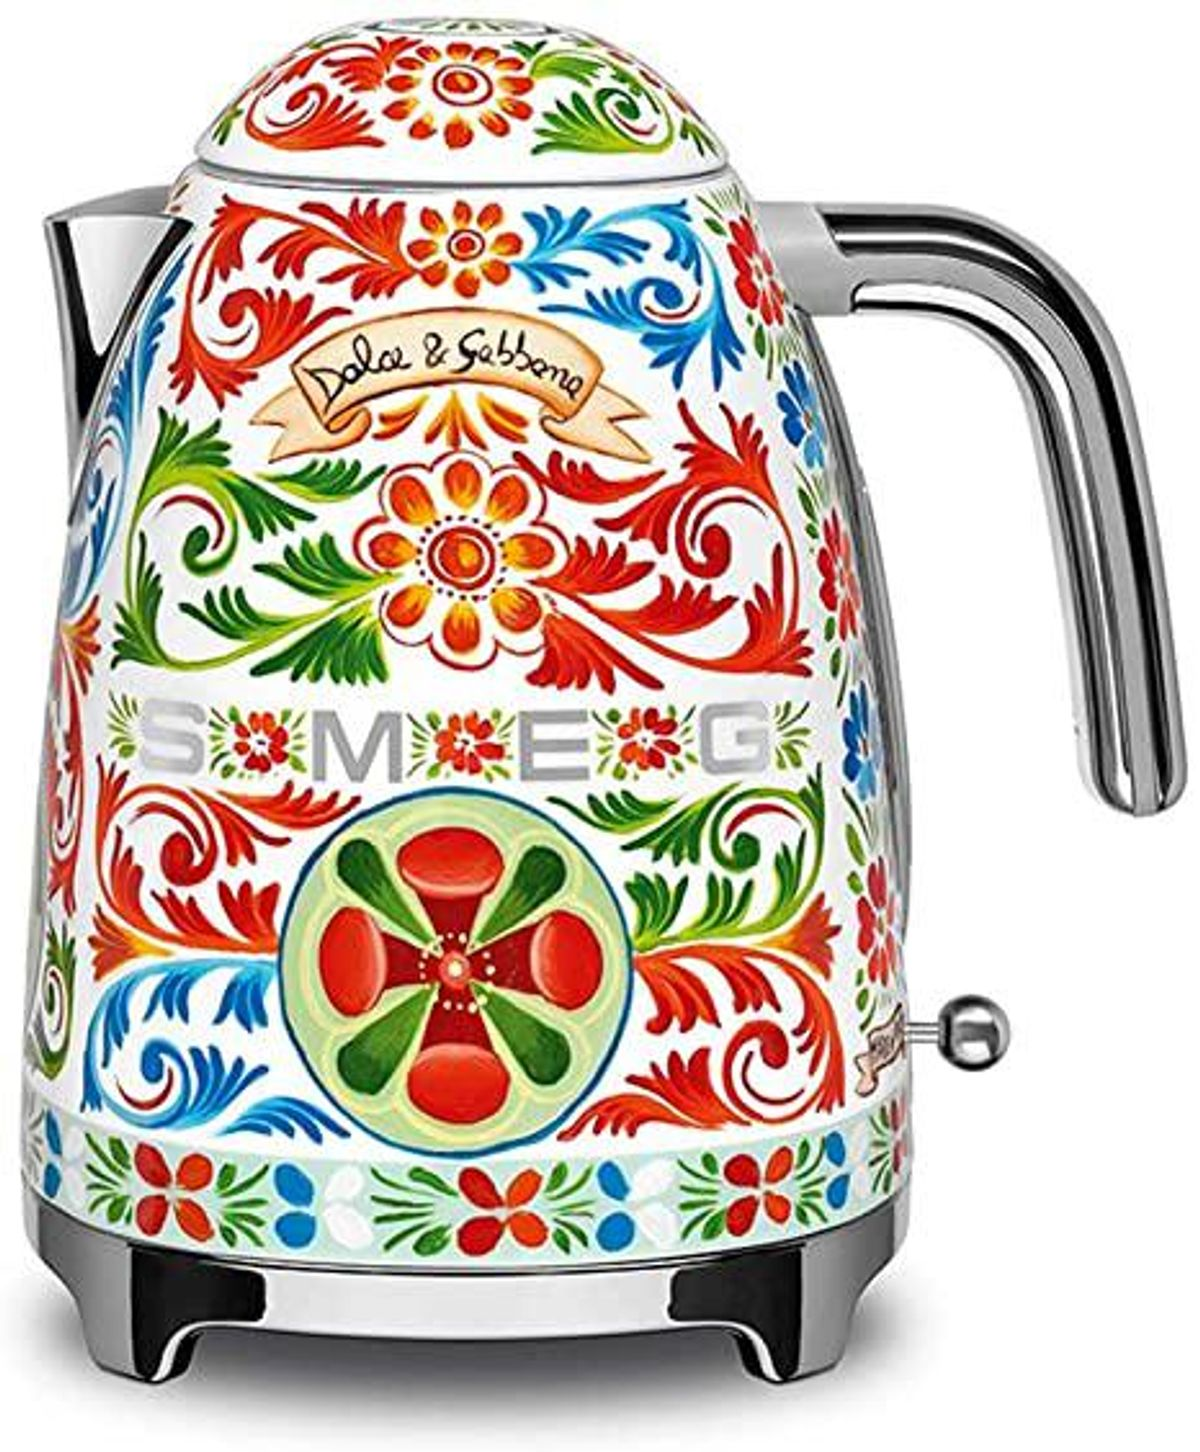 smeg x dolce & gabbana sicily is my love tea kettle